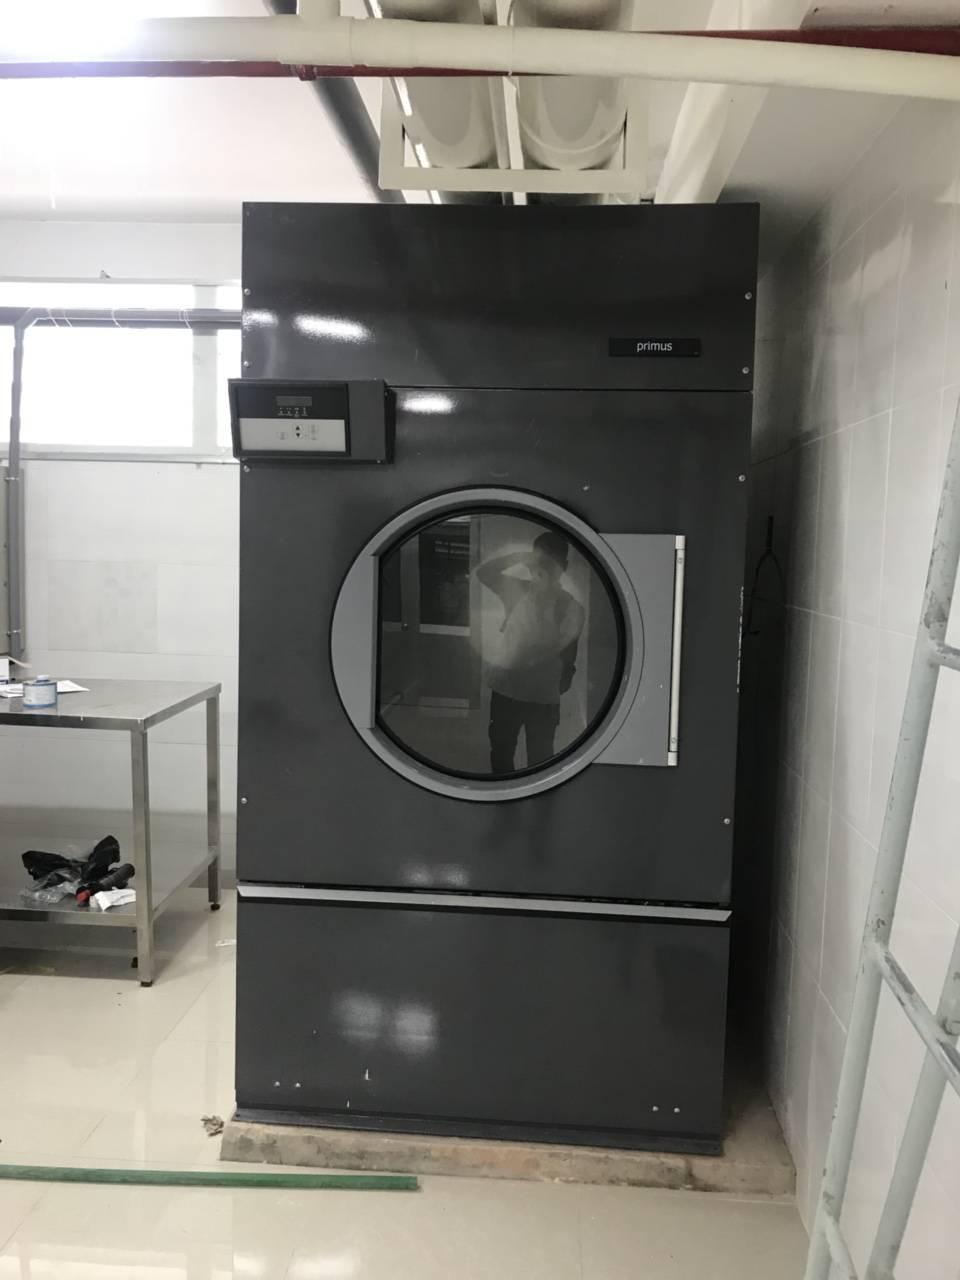 z1062755975457 2c482ec366bba0da8eb106a1b5e132d0 - Mua máy giặt công nghiệp cũ | Máy giặt công nghiệp bãi giá rẻ